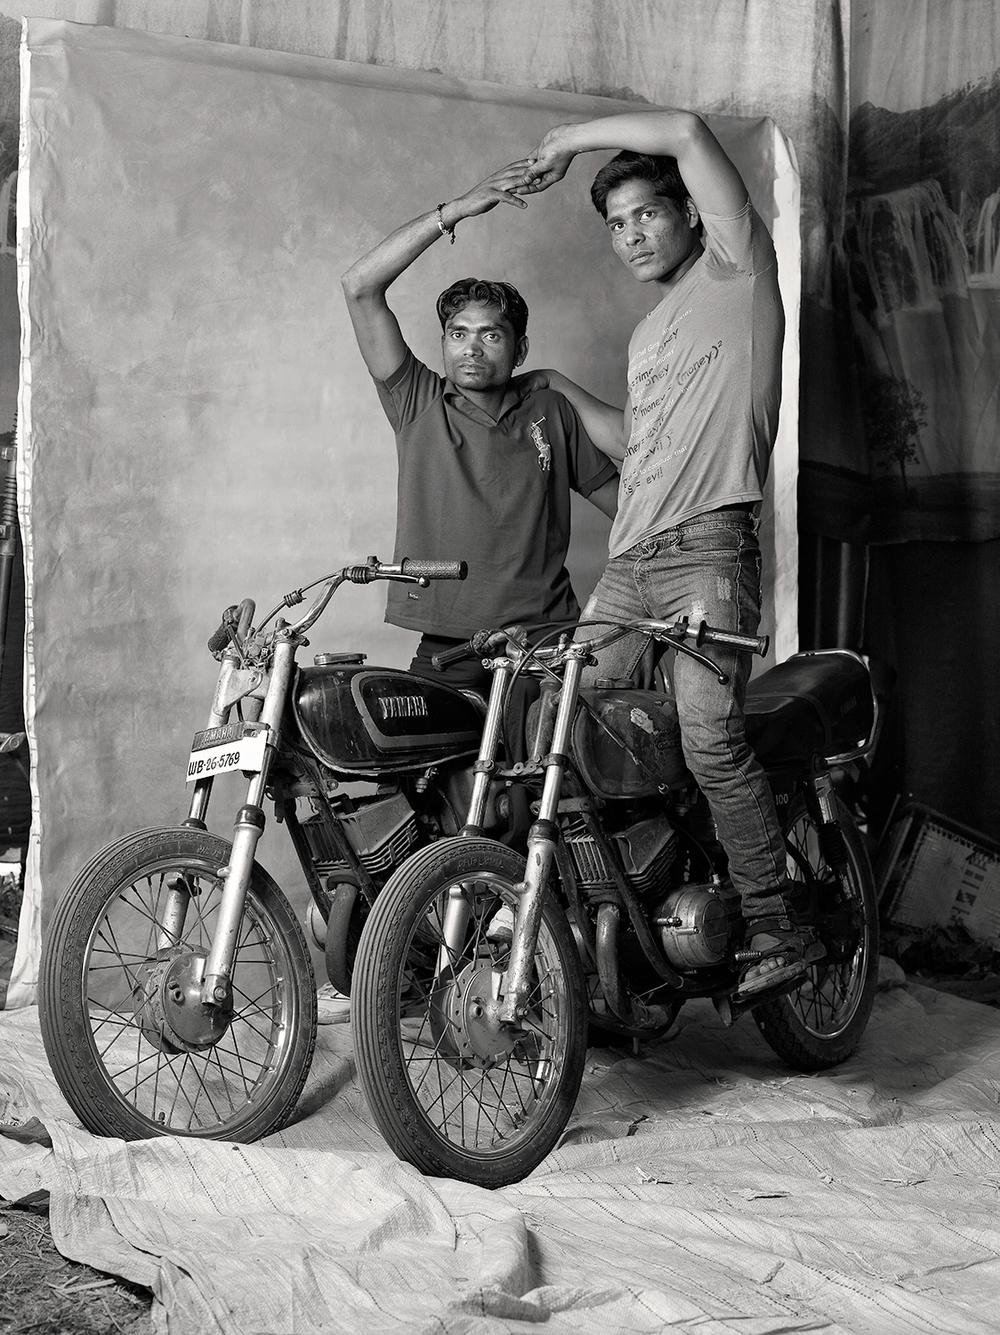 DEATH-WELL MOTORBIKE RIDERS, $40-55 WEEKLY, 2012